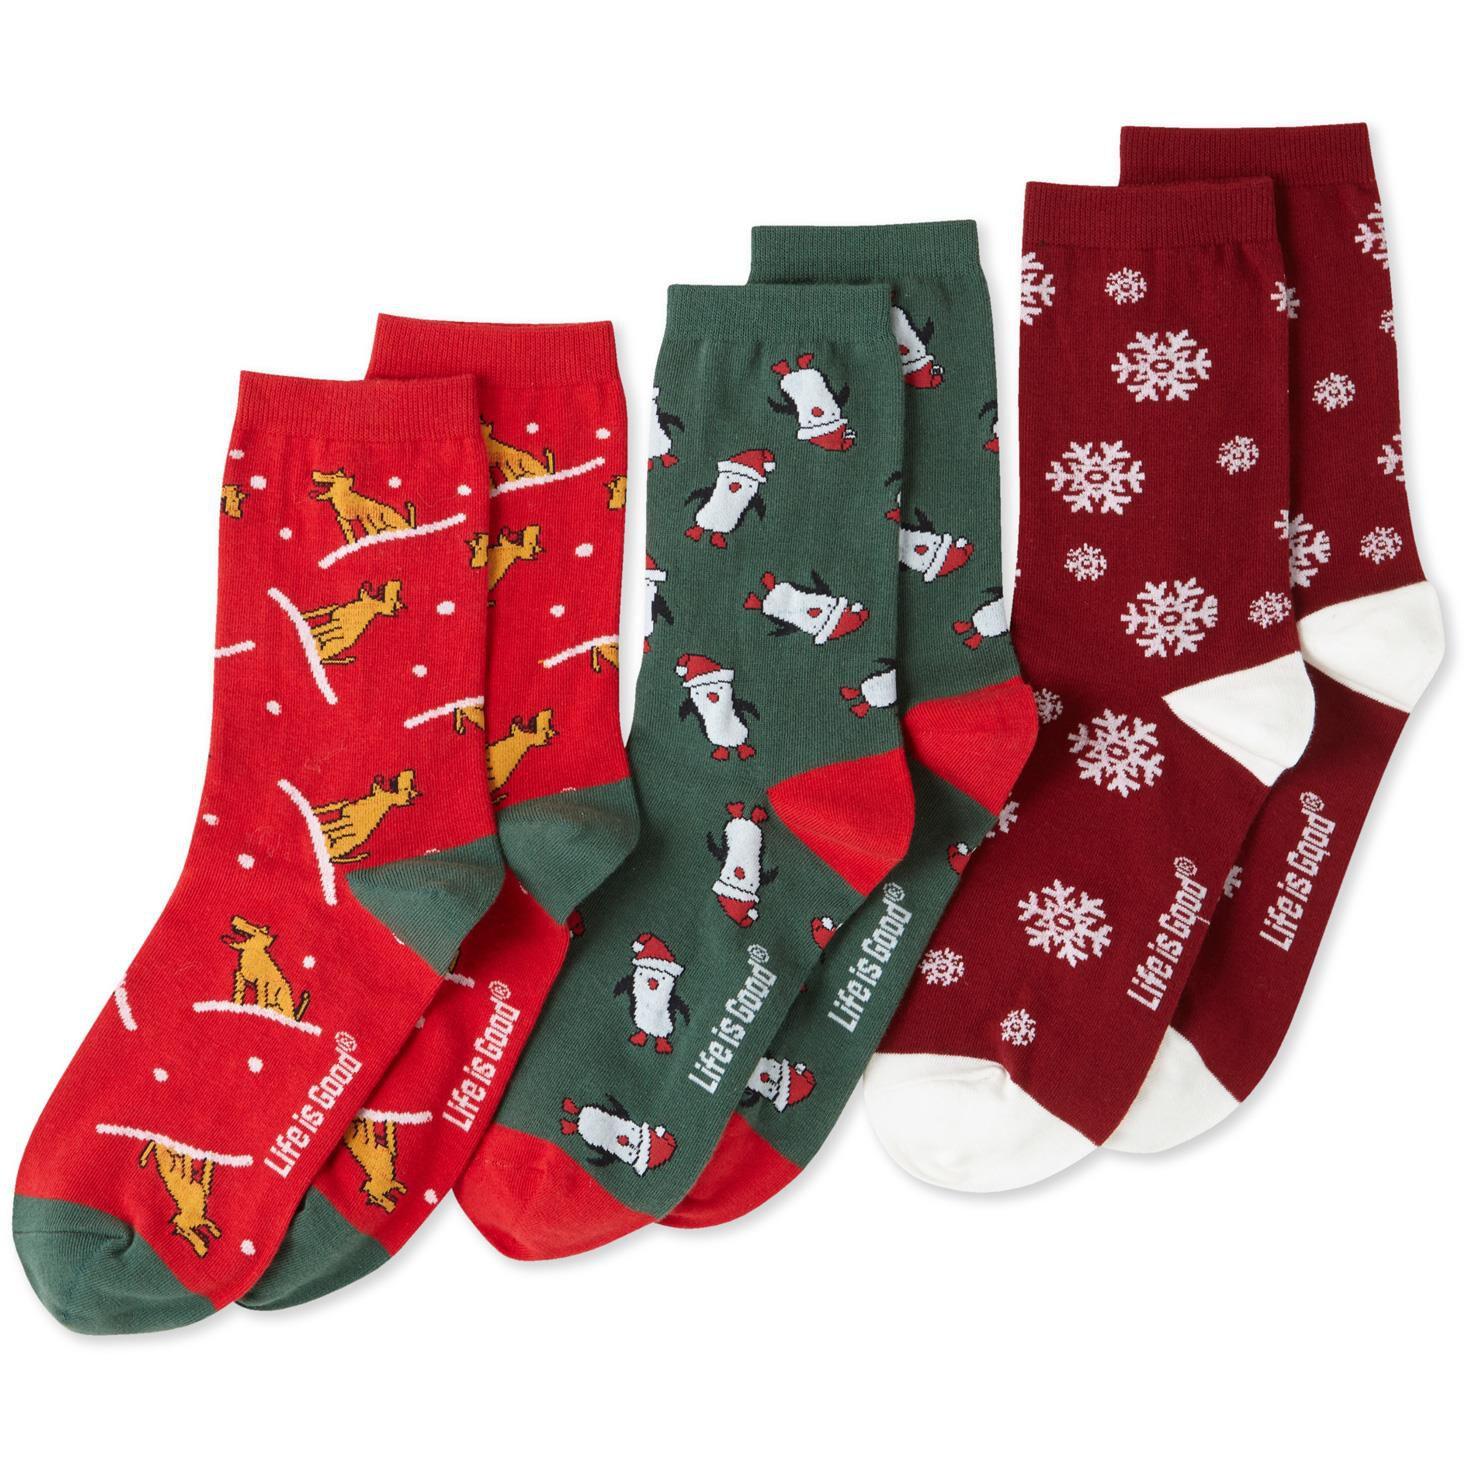 Life is Good Women s Holiday Crew Socks Set of 3 Socks & Shoes